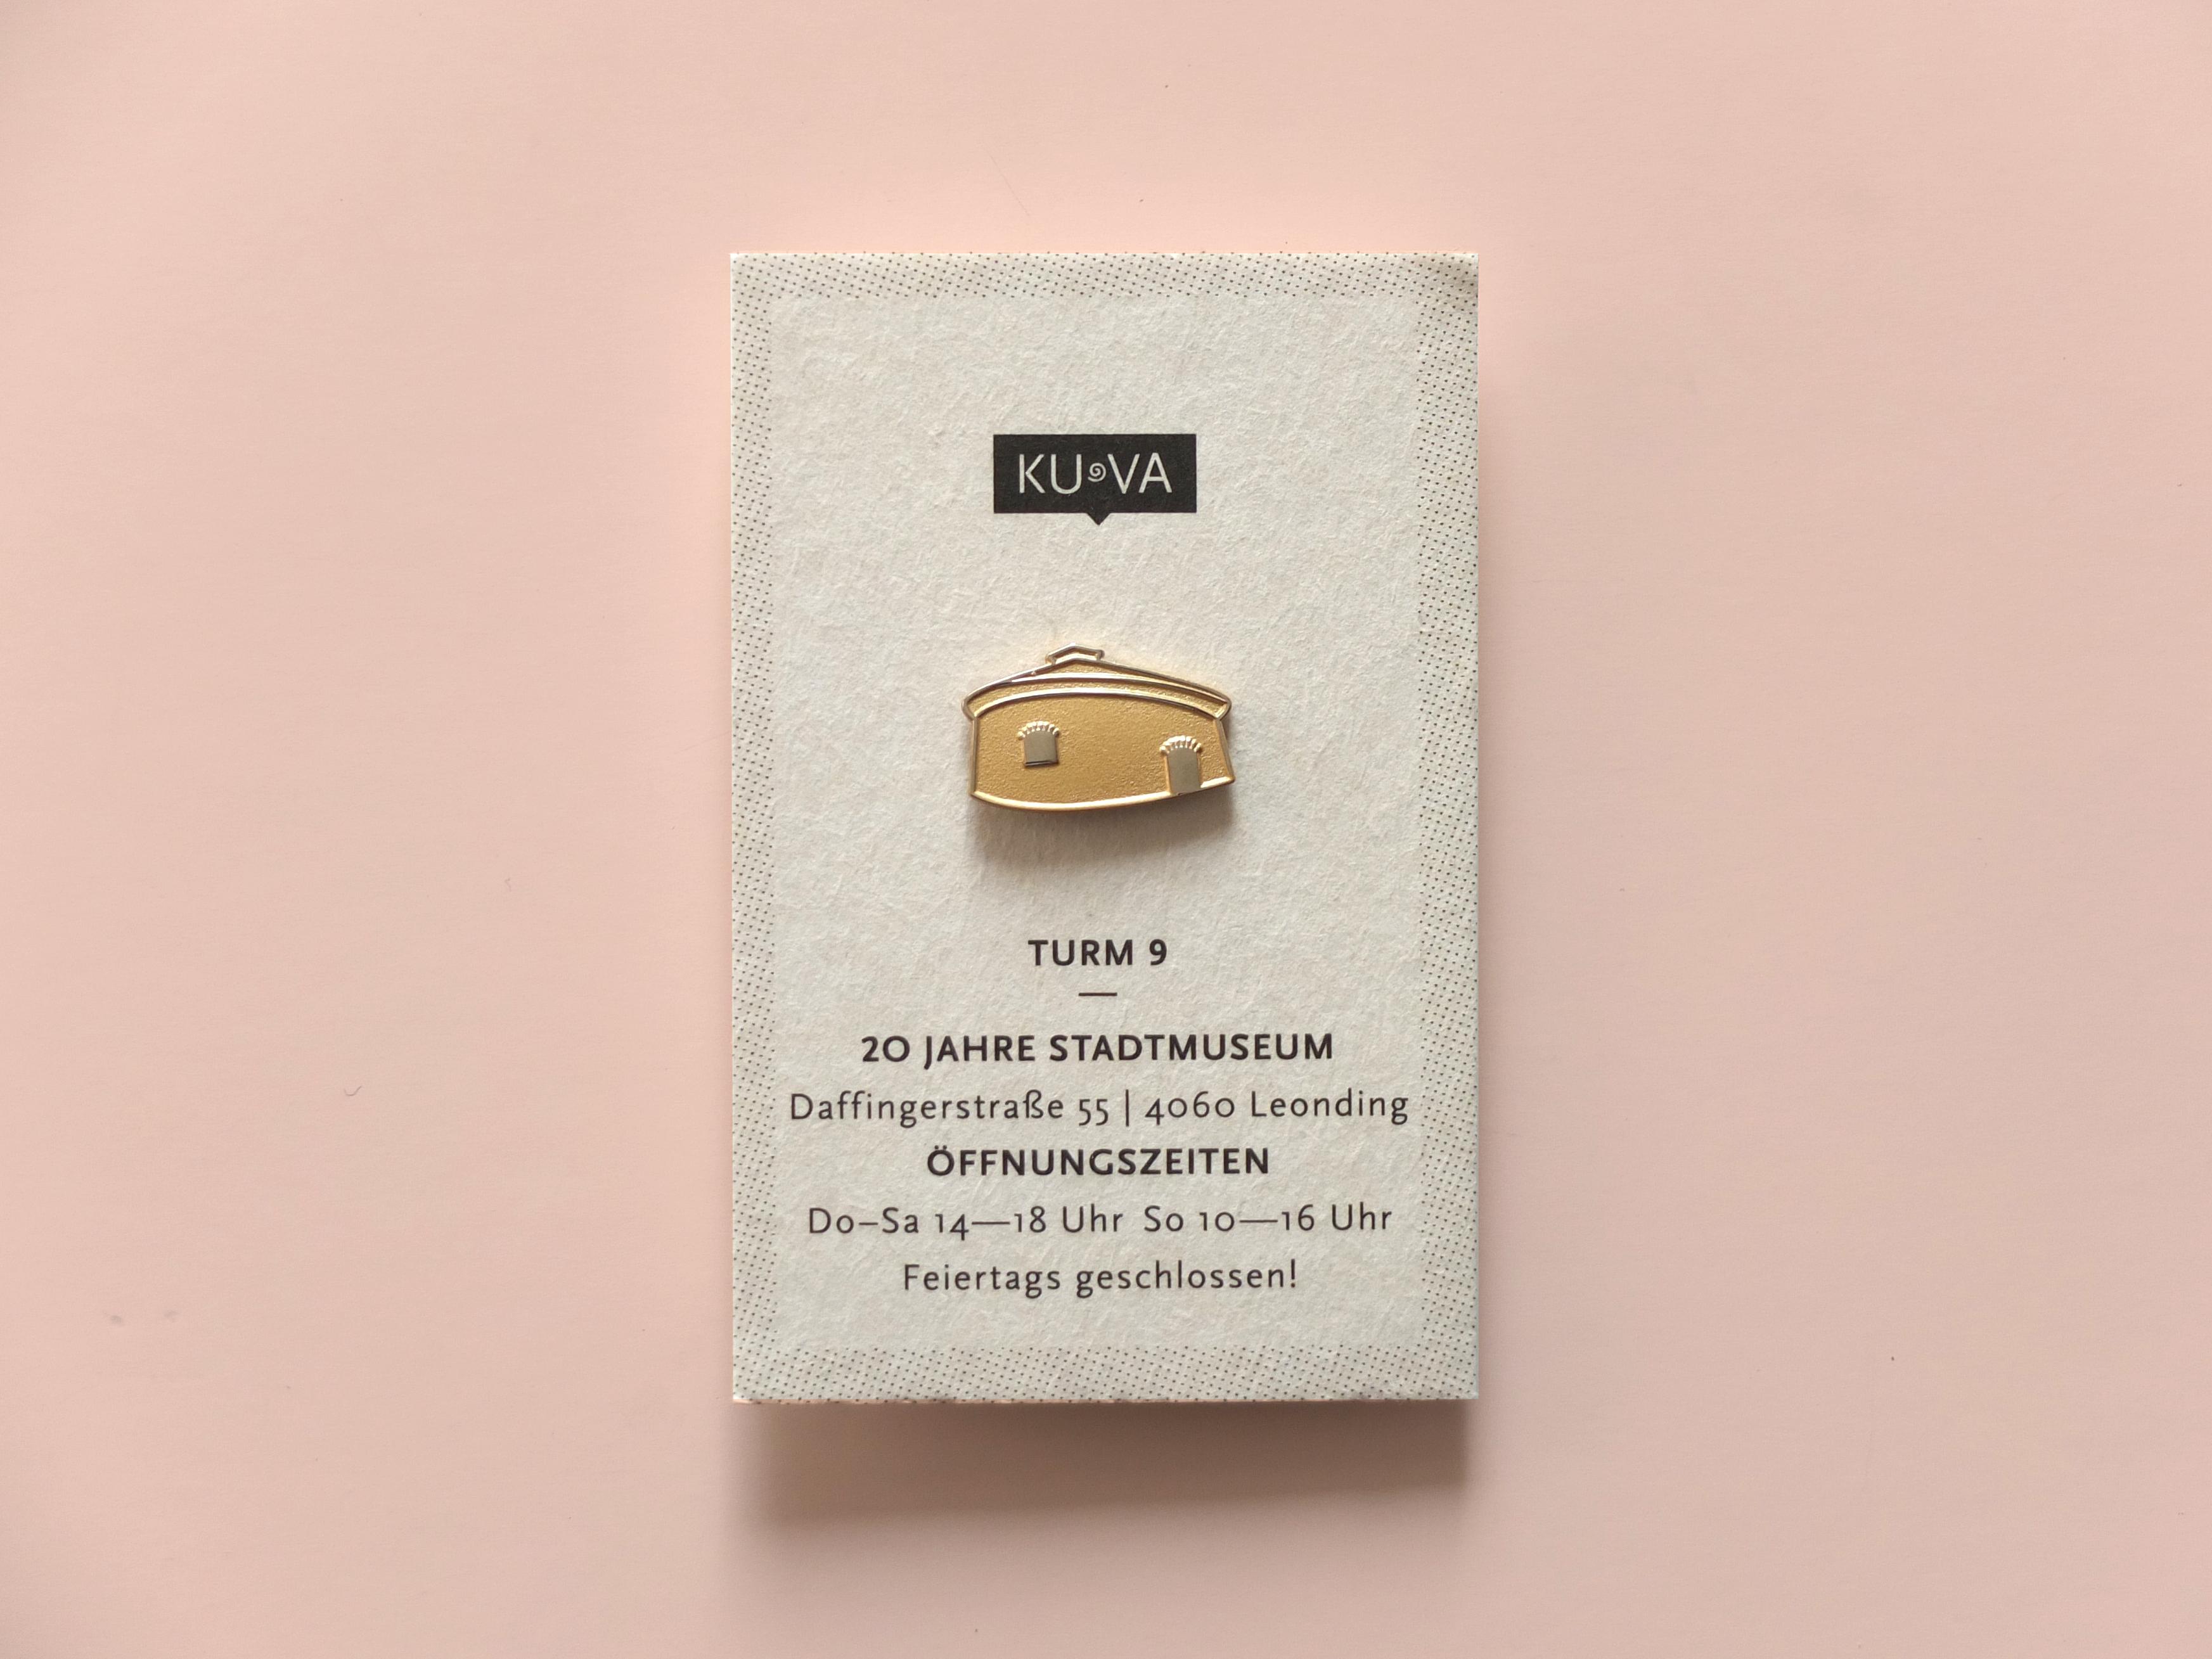 Turm 9 Jubiläums Pin für die KUVA | Illustration: Silke Müller